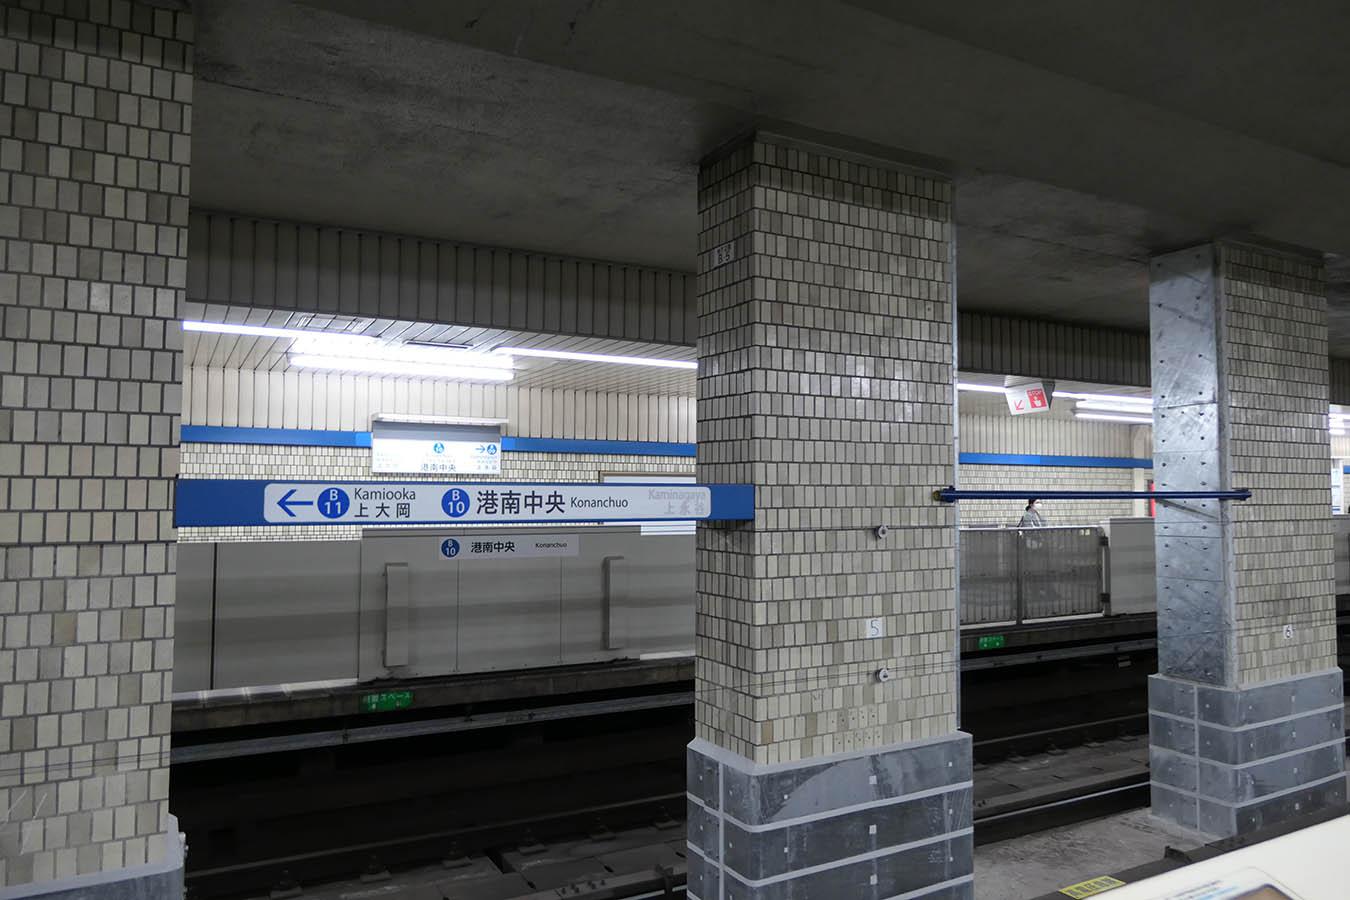 YMS-B10_photo03.jpg